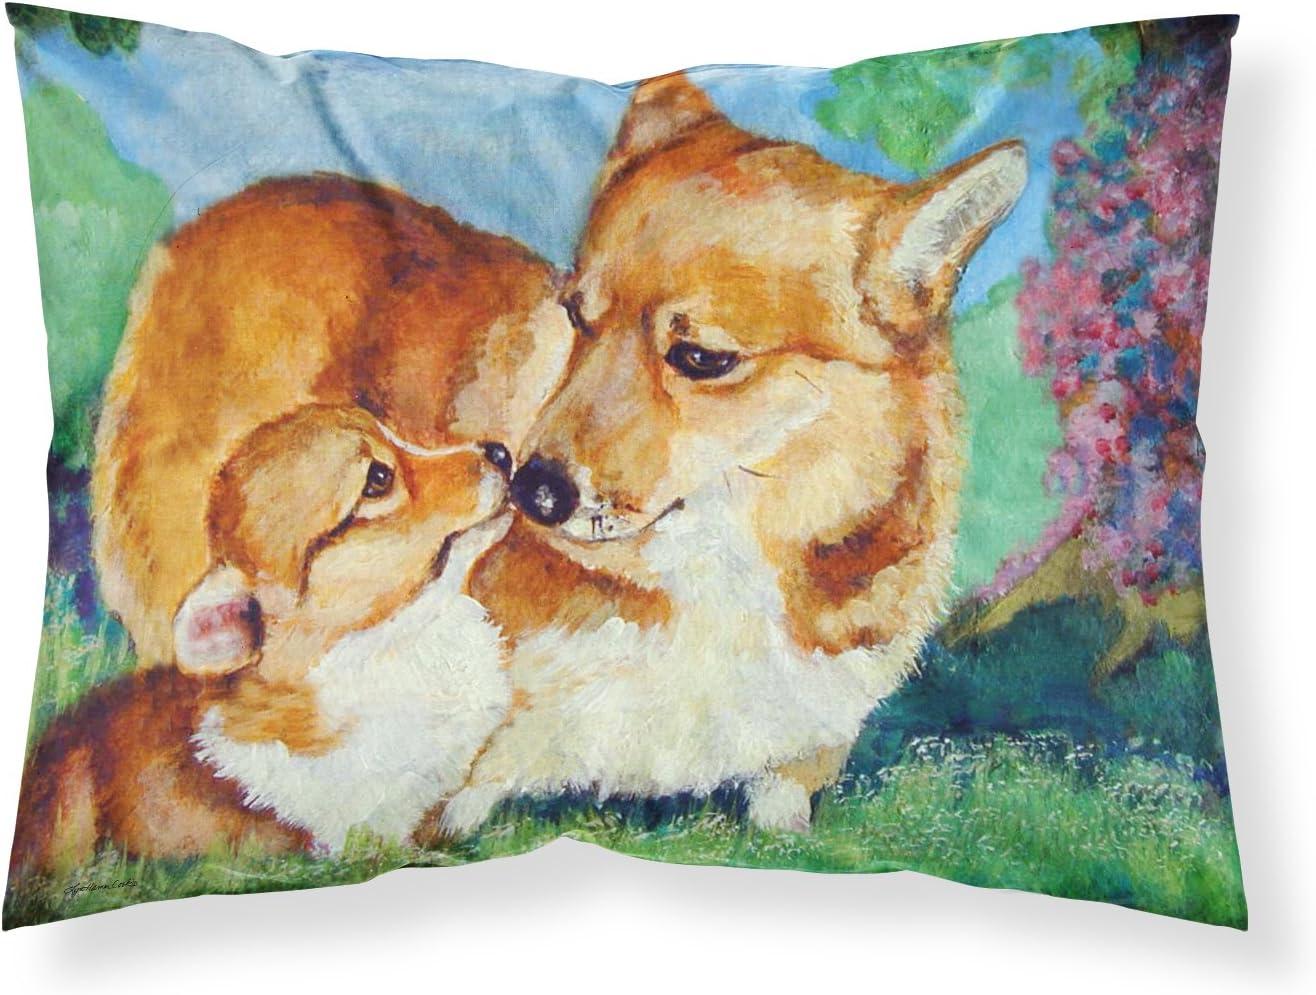 Amazon Com Caroline S Treasures 7412pillowcase Corgi Momma S Love Fabric Standard Pillowcase Standard Multicolor Caroline S Treasures Home Kitchen